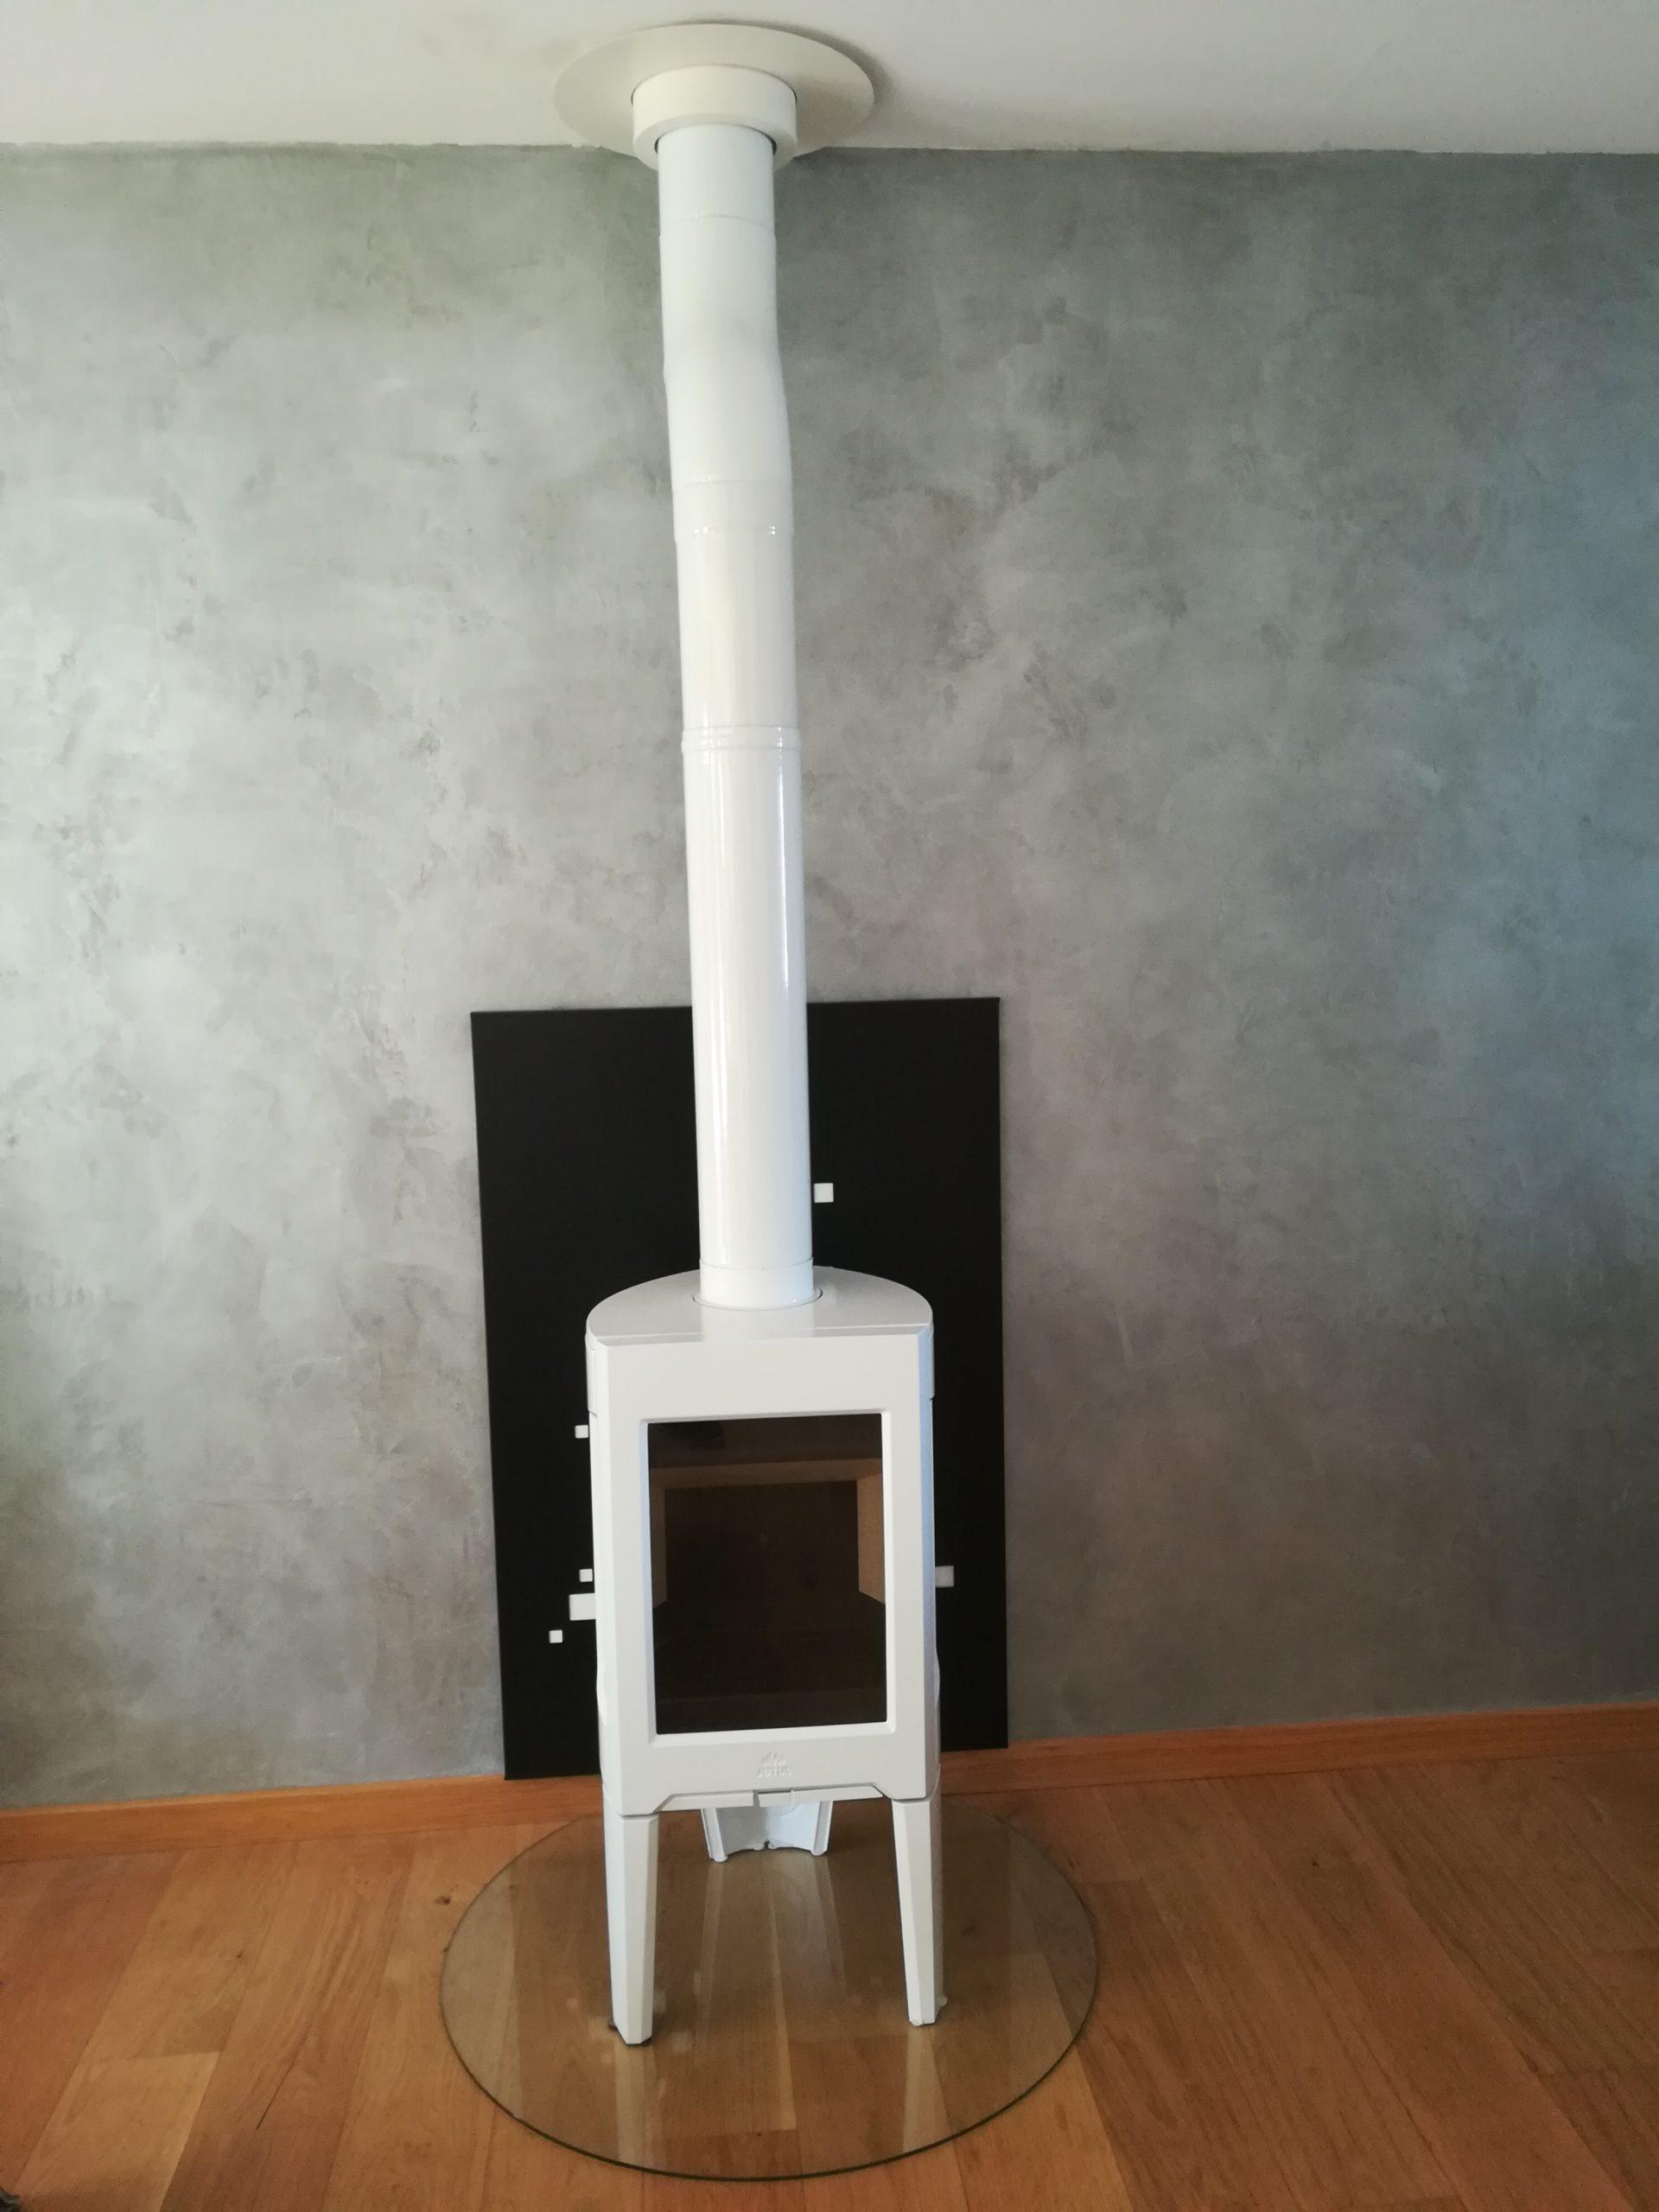 Poêle à bois scaled - Galerie Chauffage / Plomberie